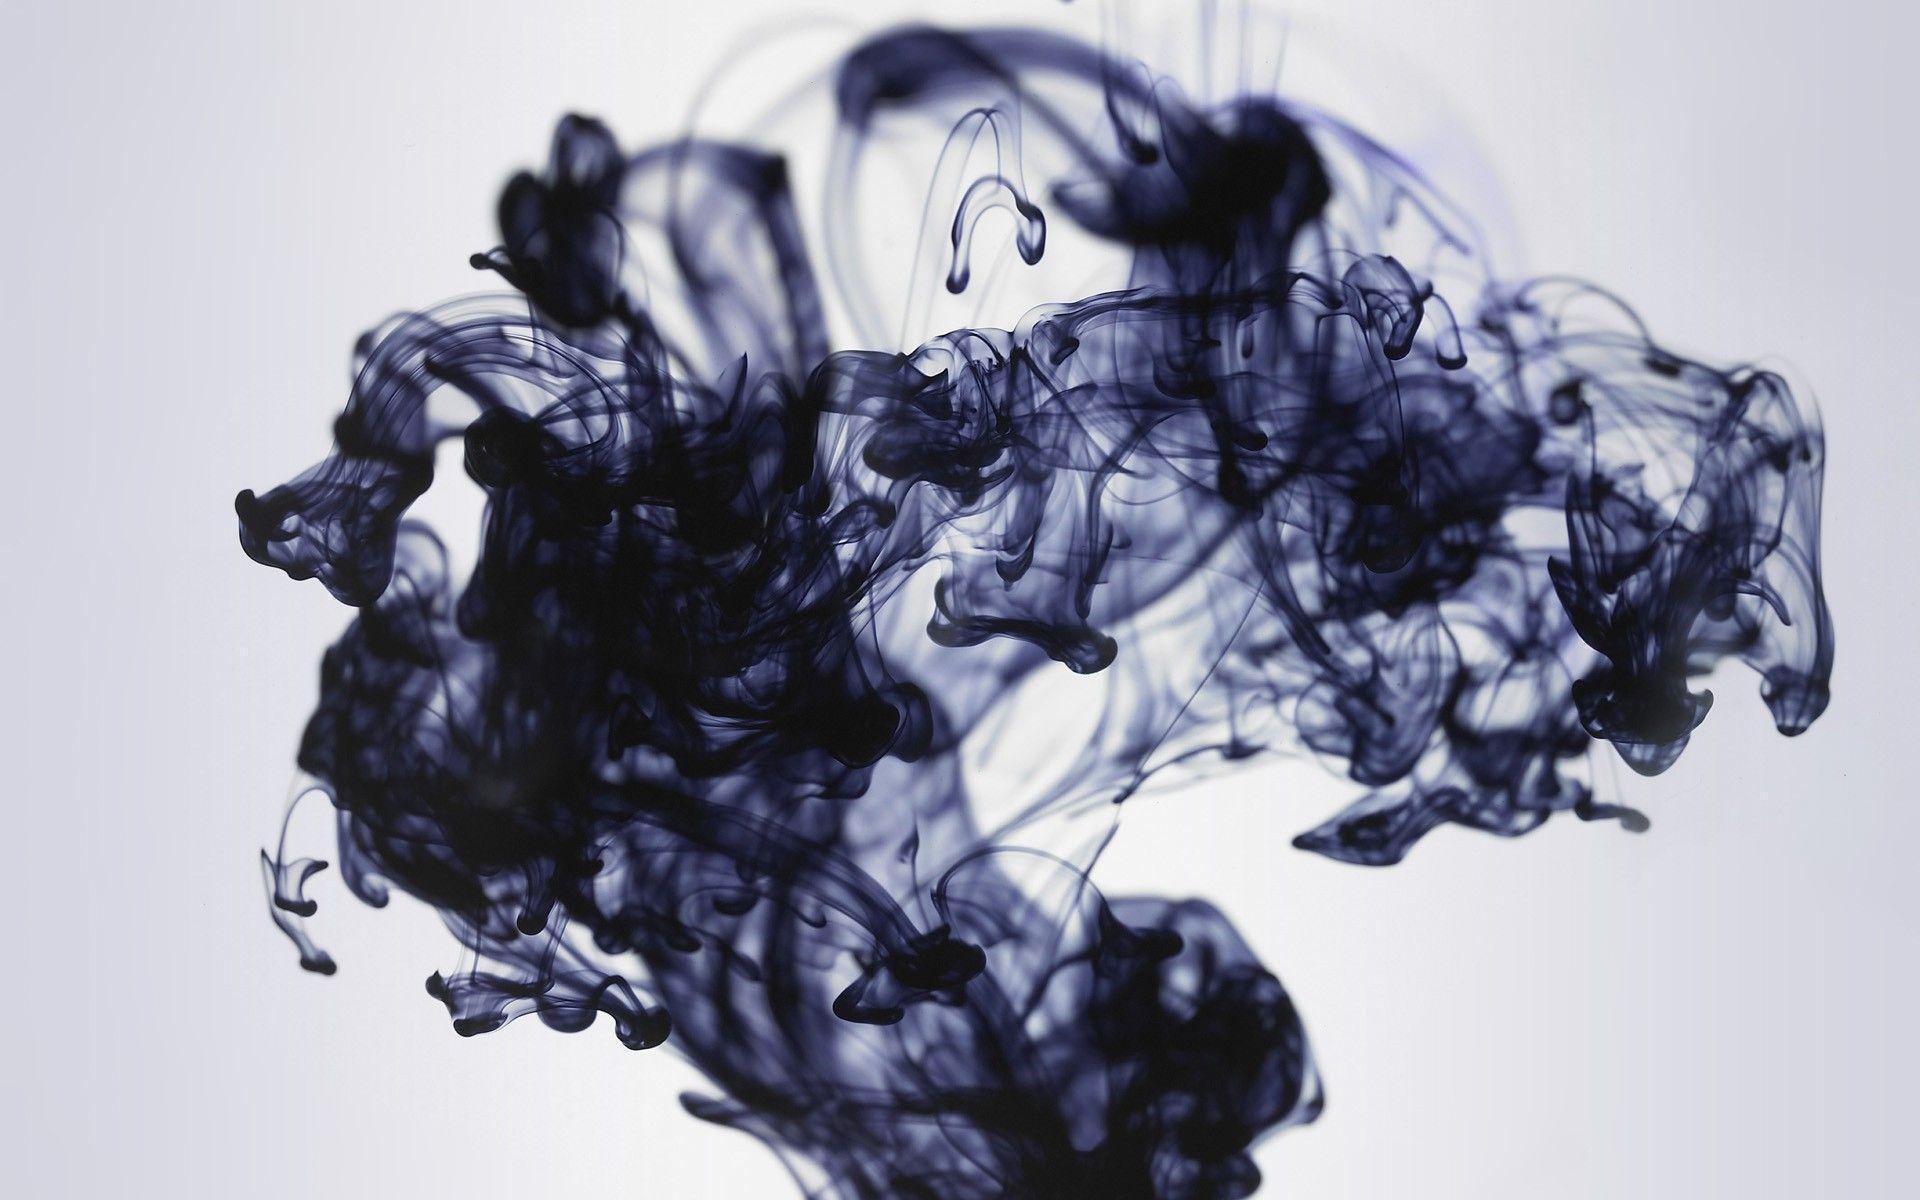 Blue Smoke Wallpapers – Wallpaper Cave